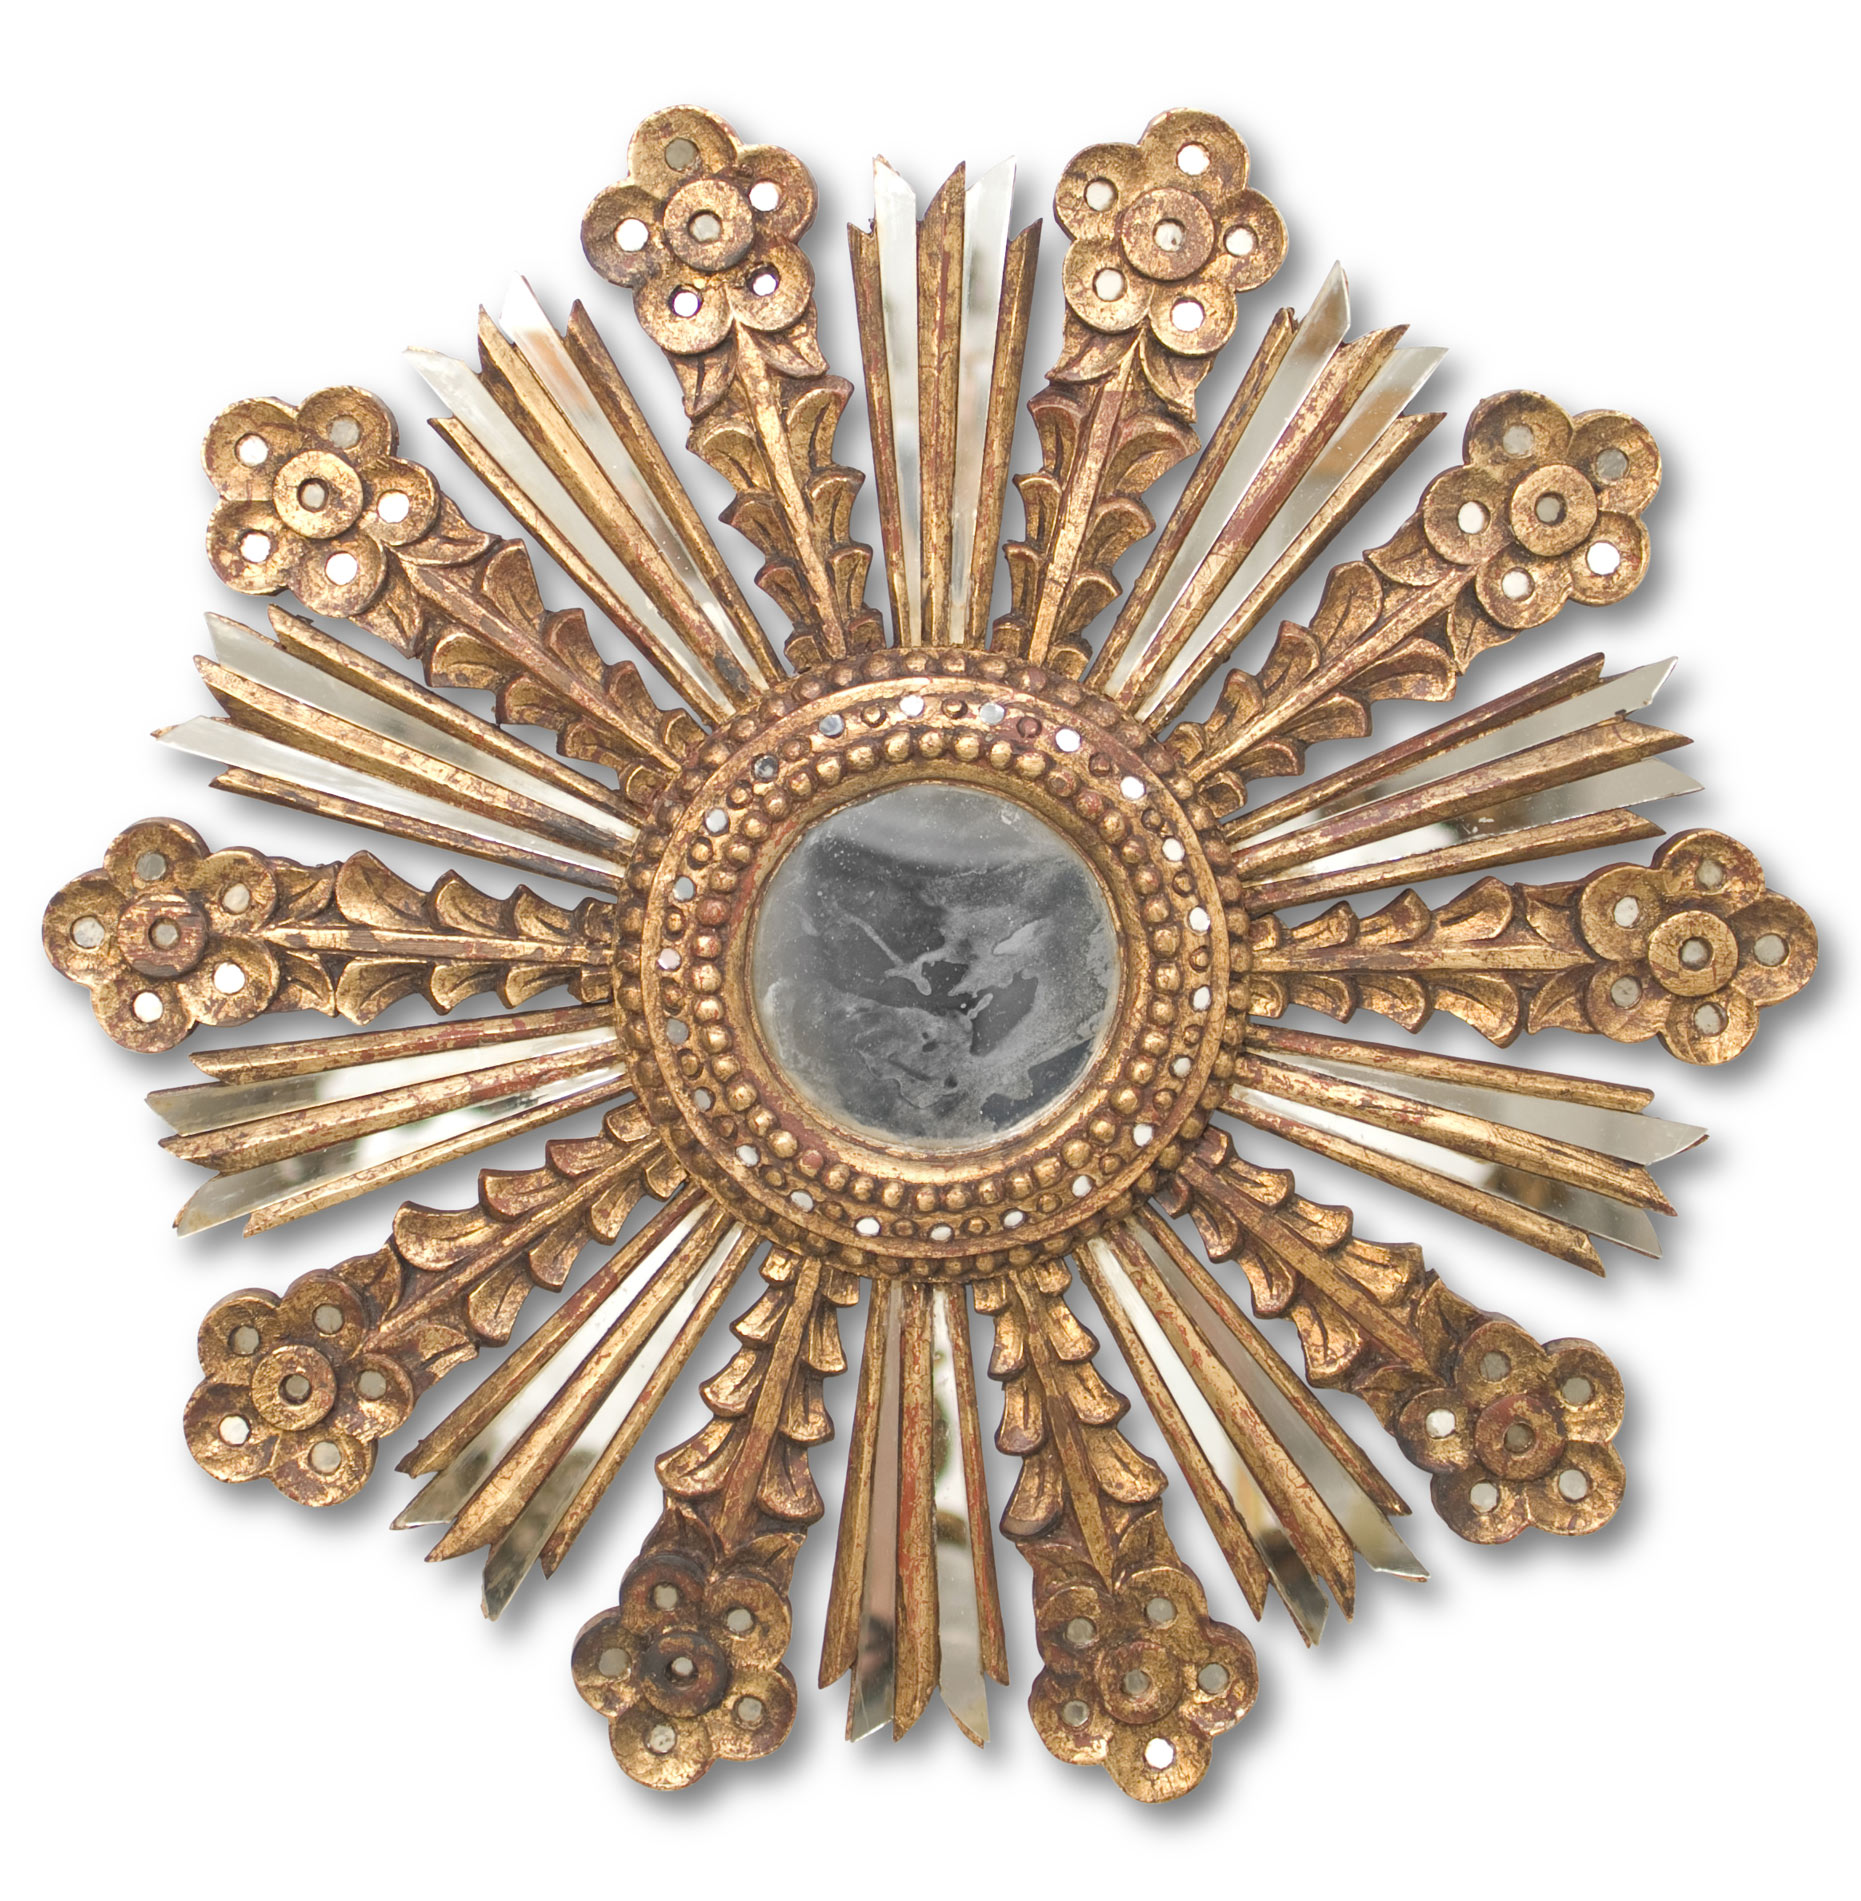 Sonrisa Global Bazaar Gold Sunburst Antique Wall Mirror